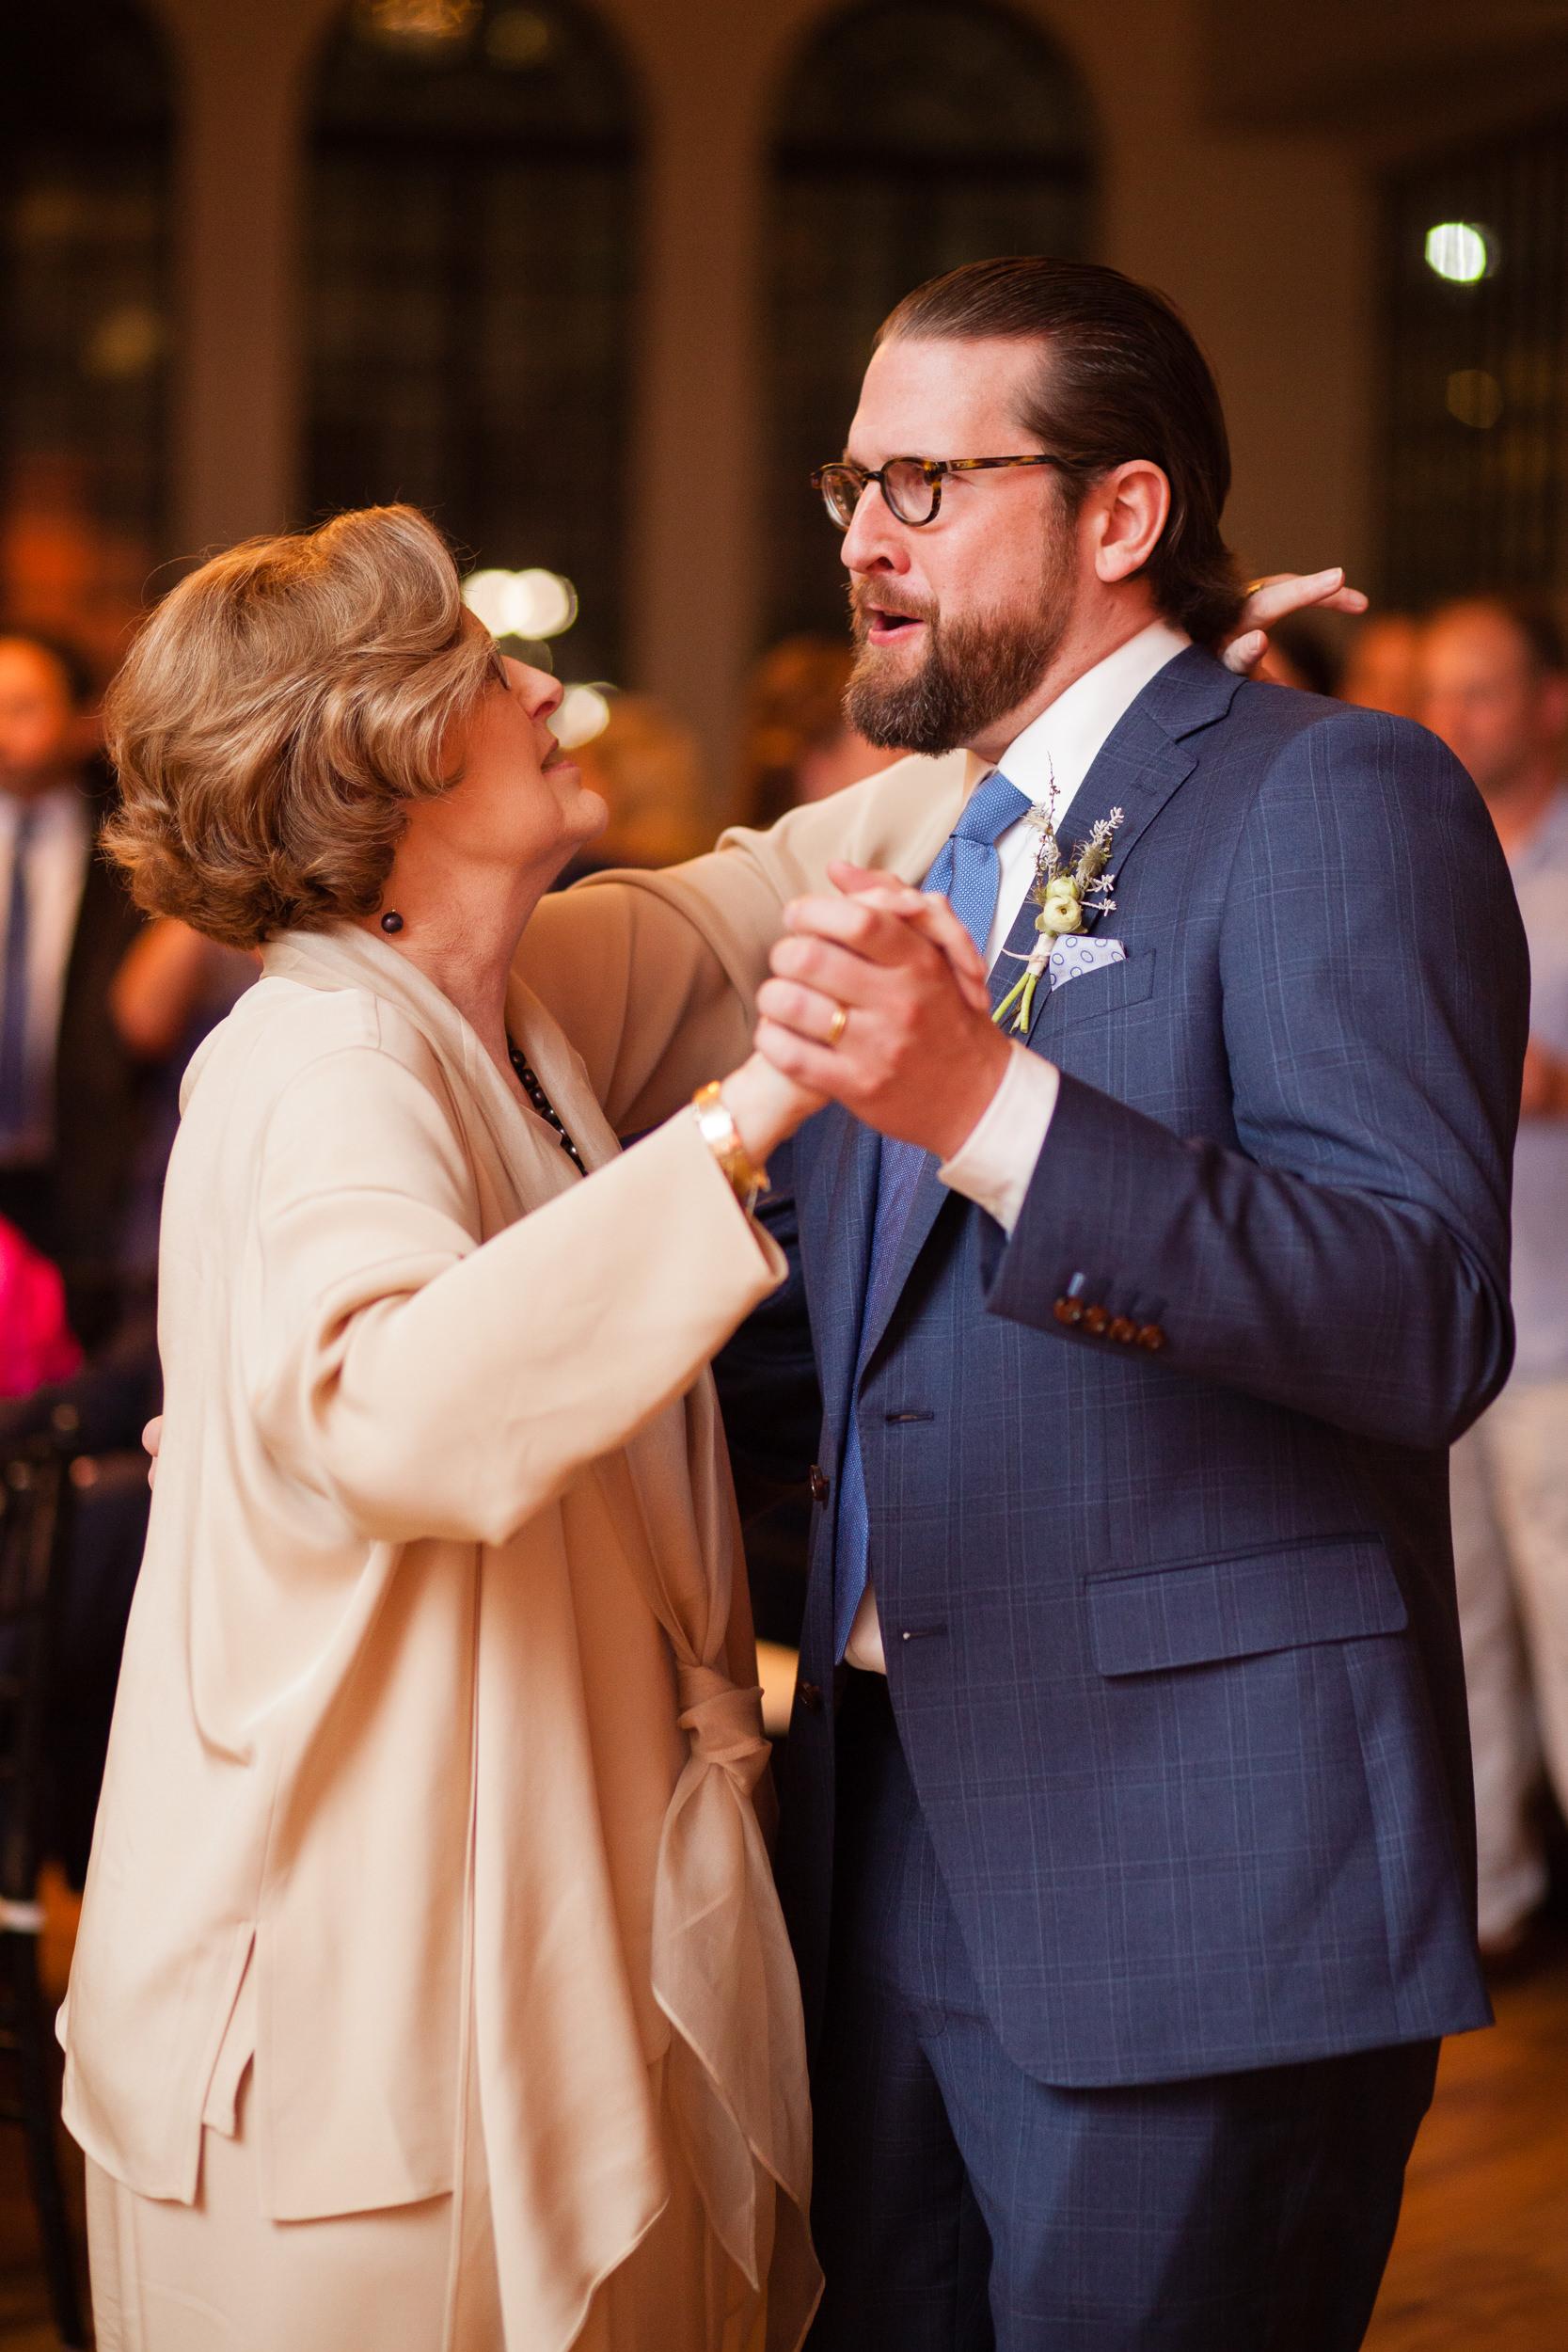 LK_Birmingham_AL_Wedding_2019-00059.jpg